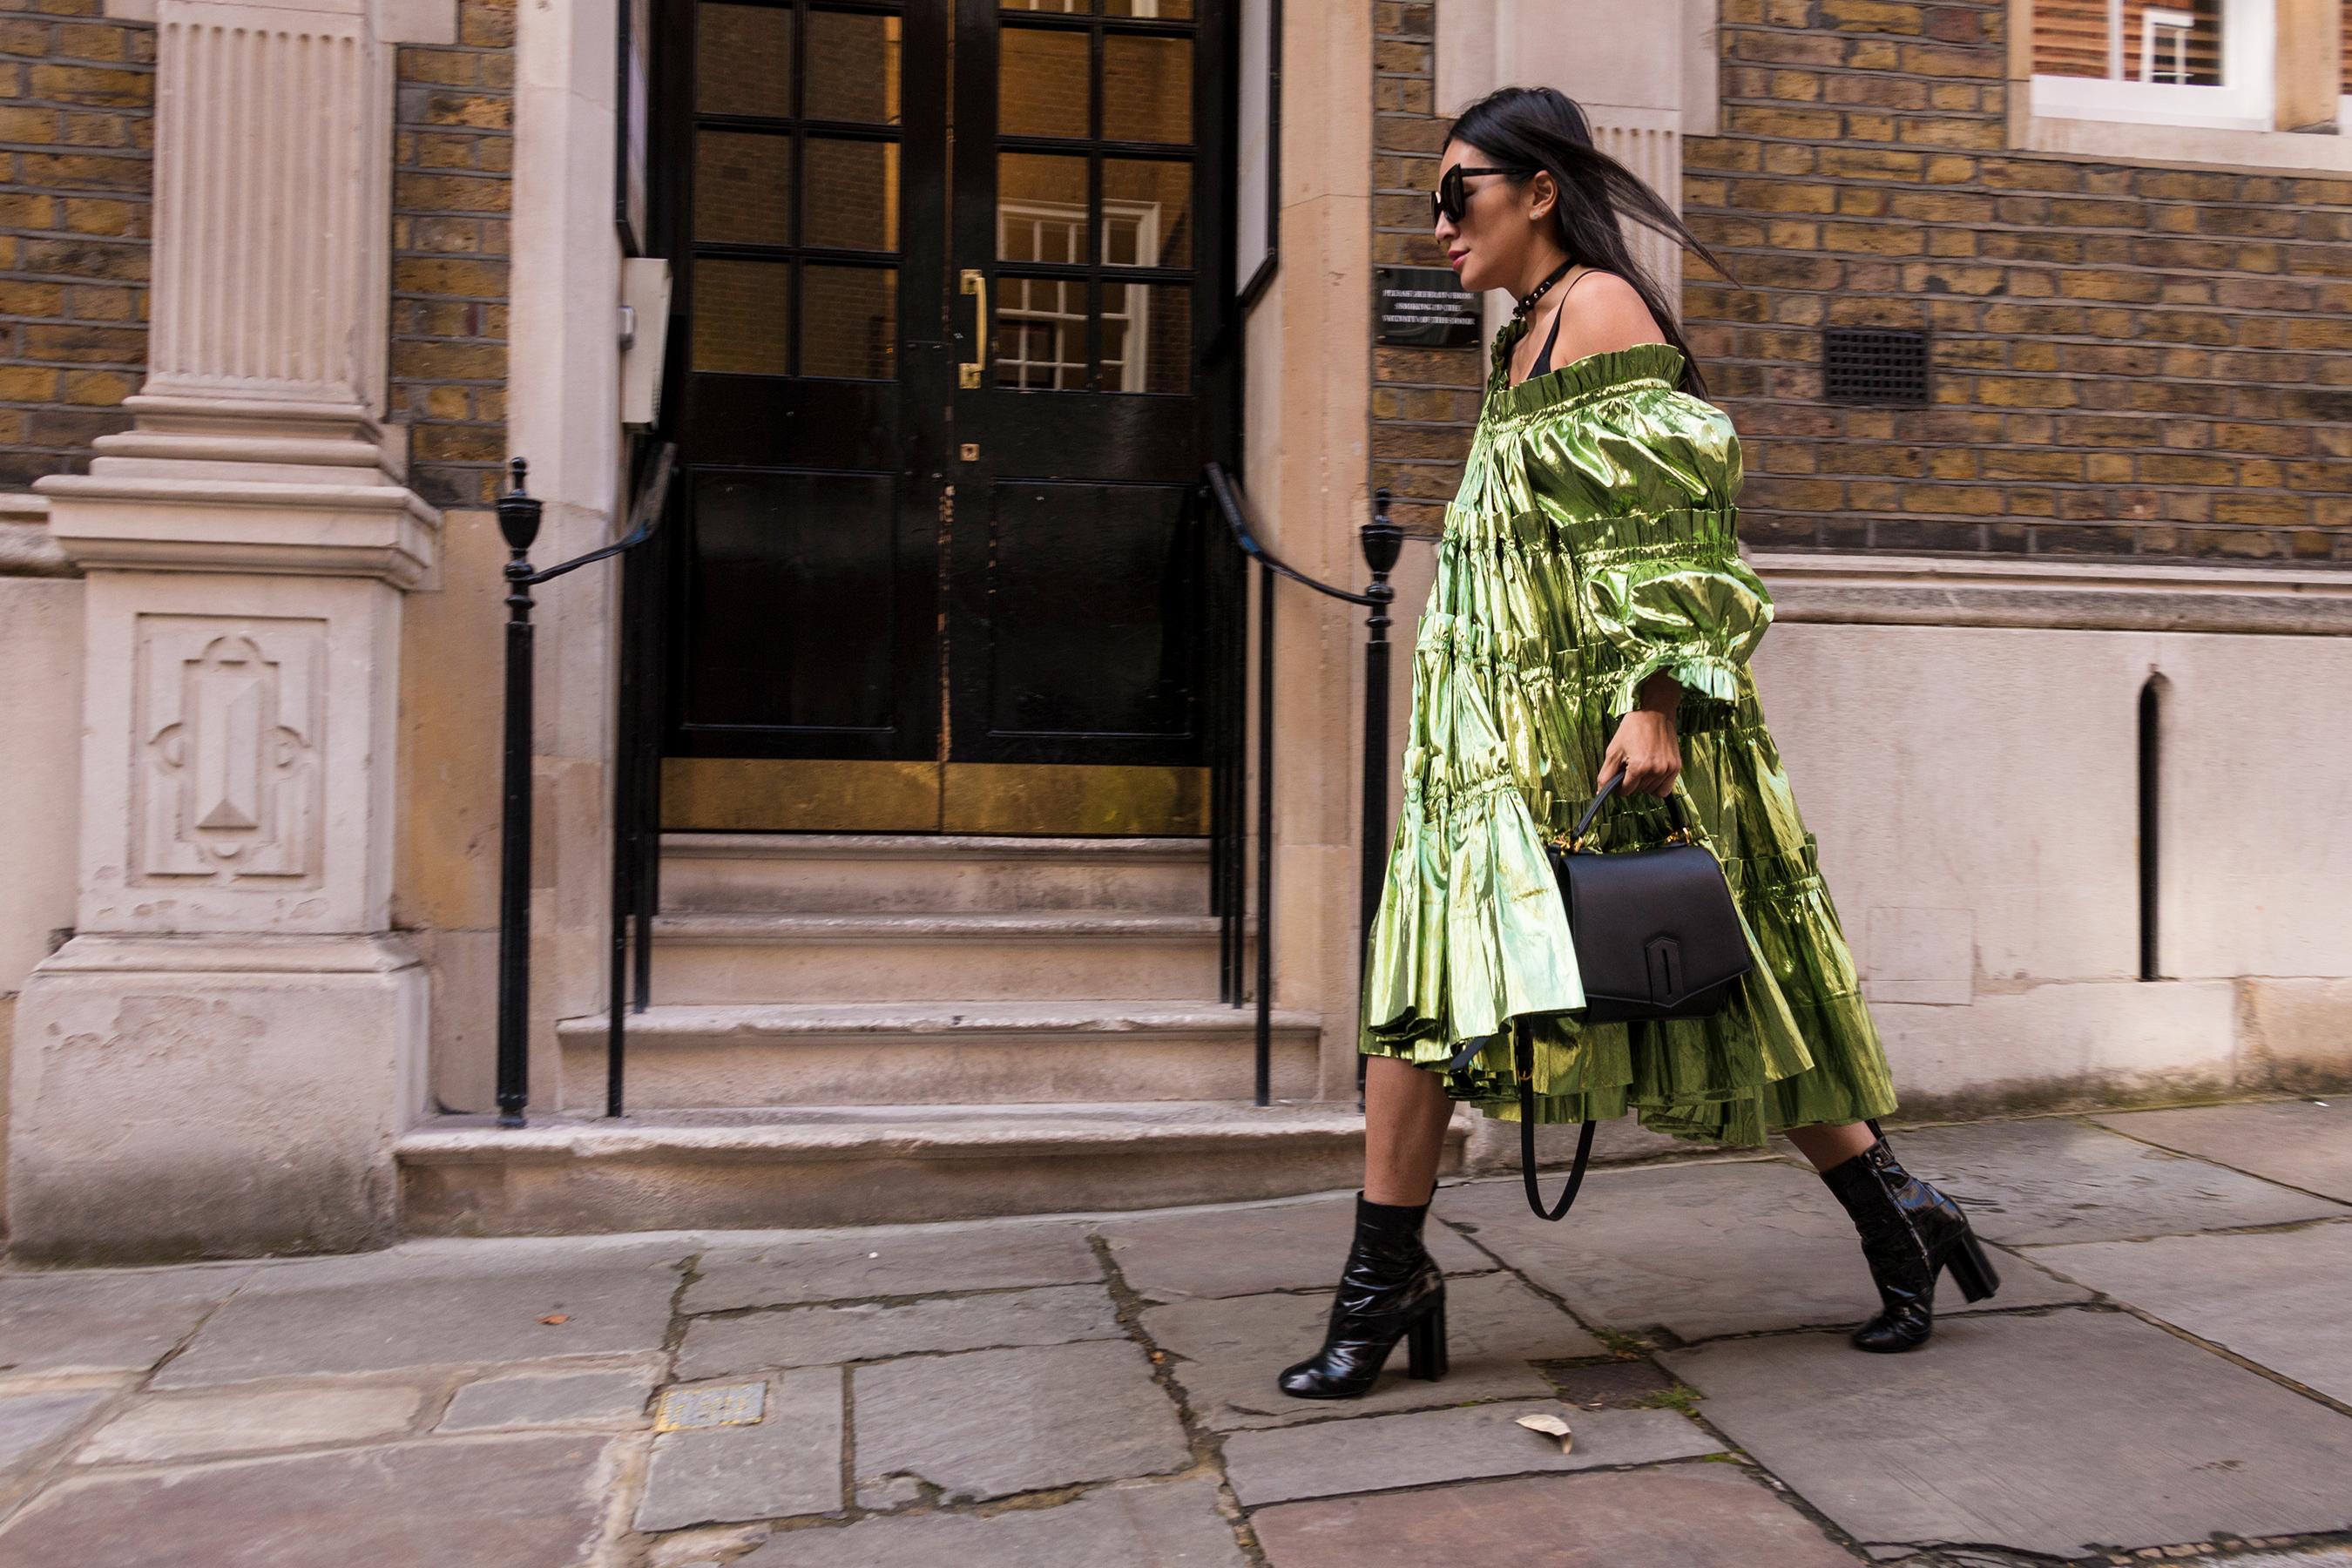 London Fashion Week Street Style Spring 2018 by Poli Alexeeva